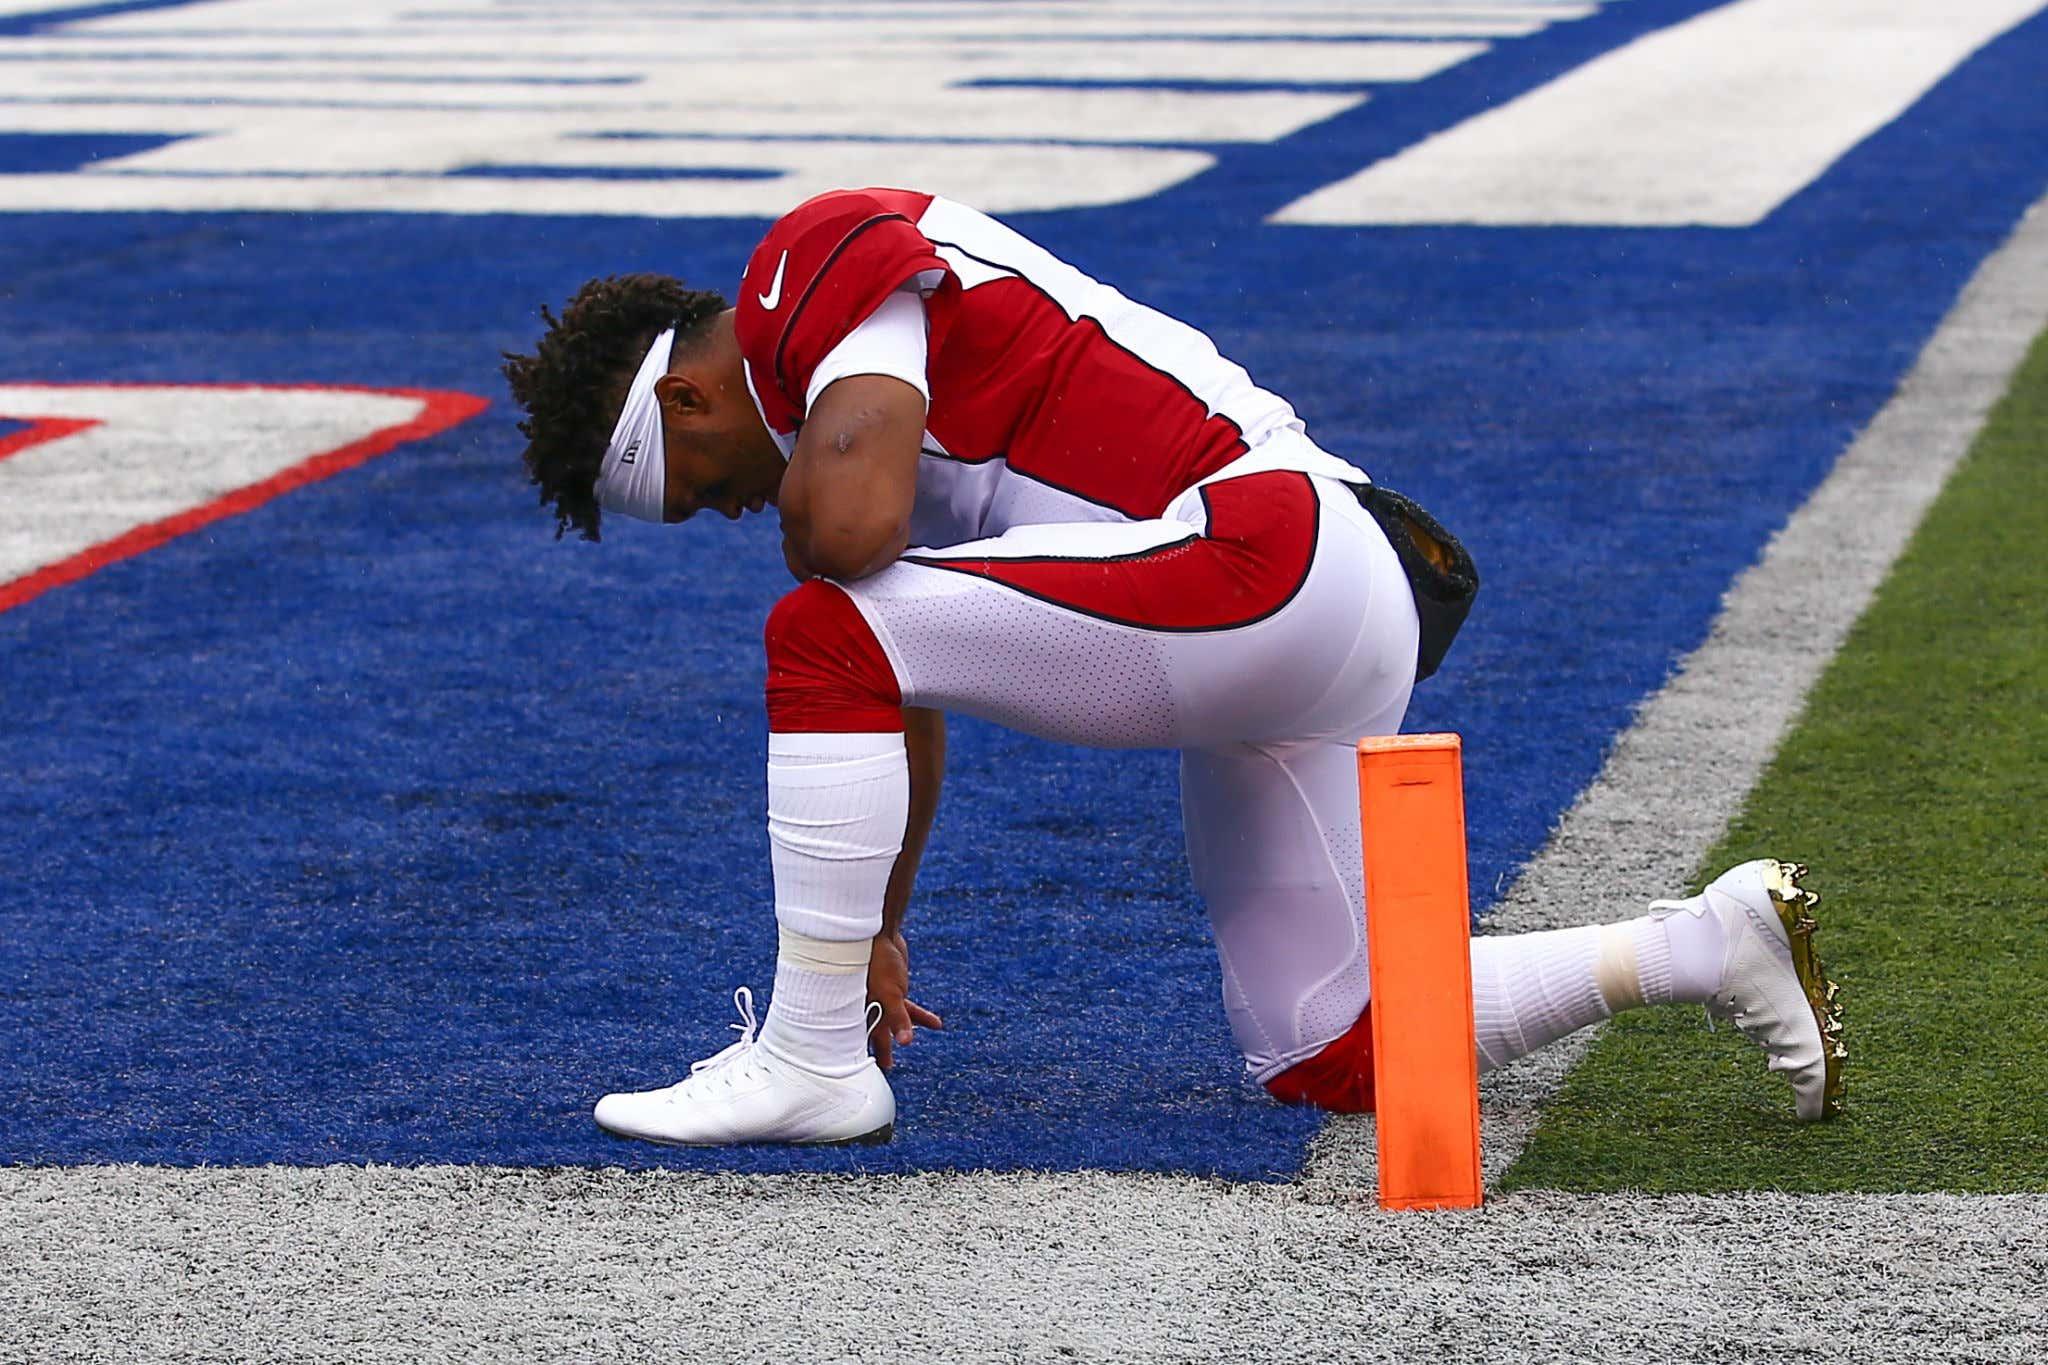 NFL: OCT 20 Cardinals at Giants